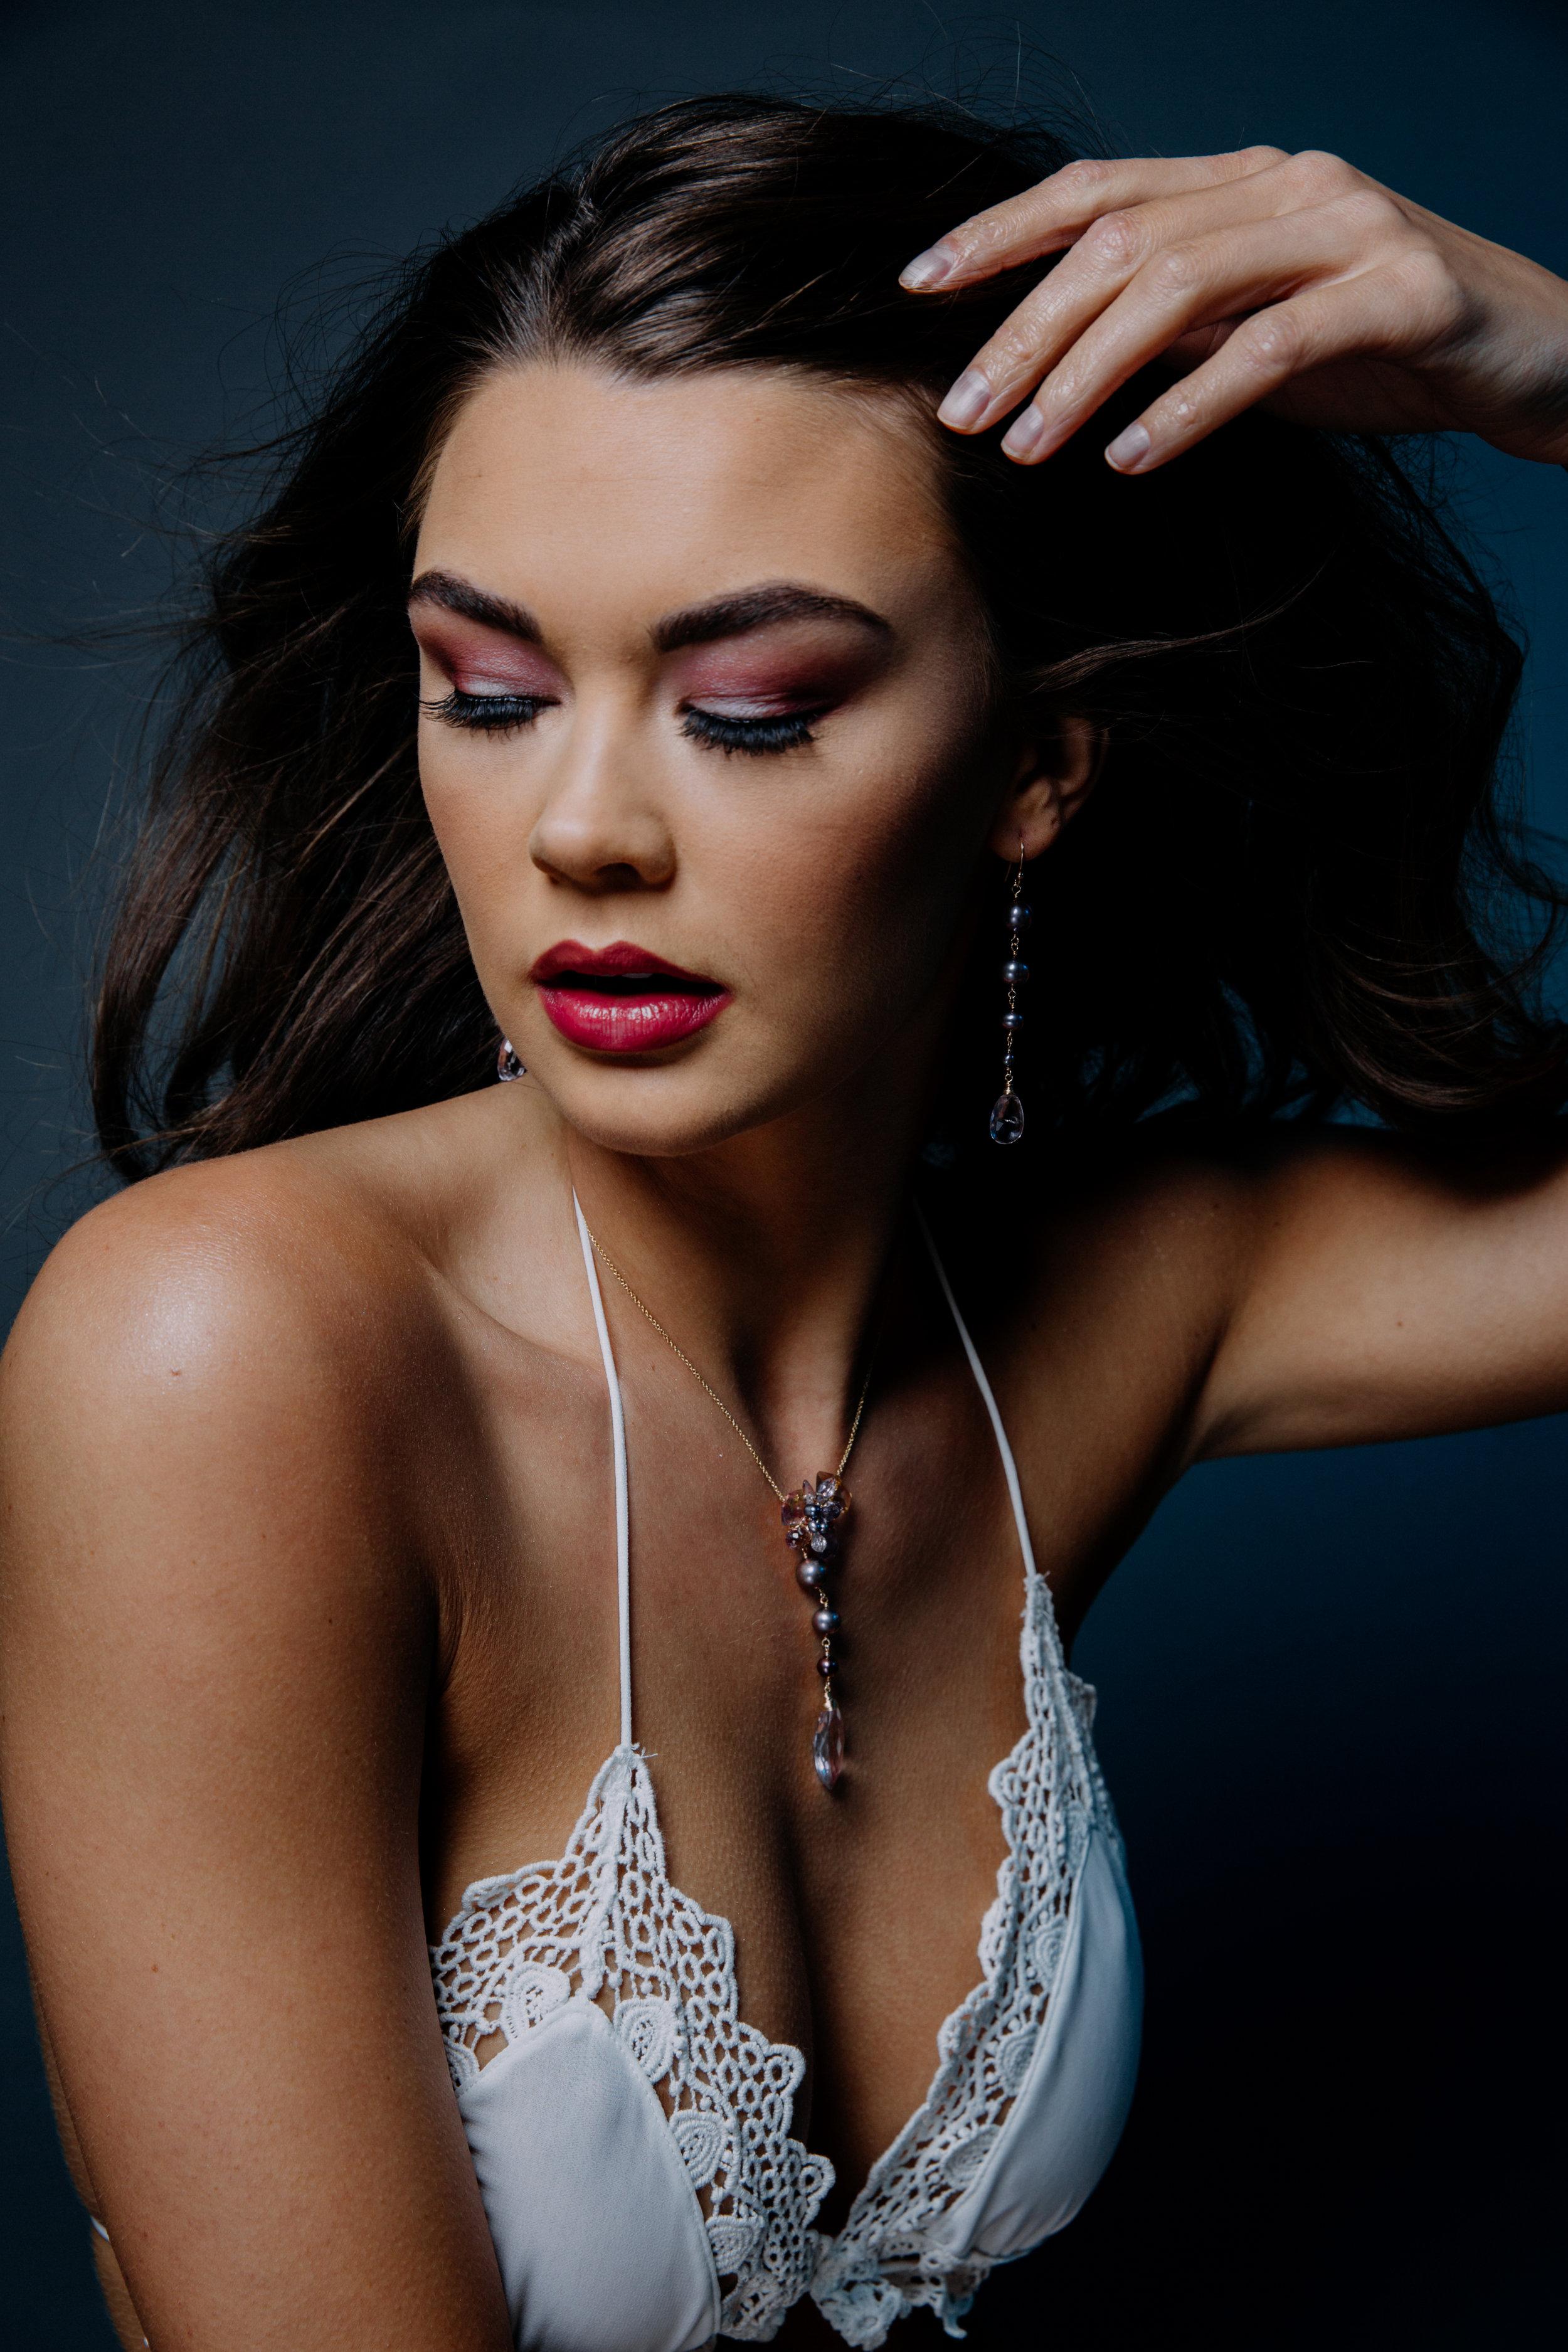 model wearing pearl amethyst and ametrine drop pendant necklace